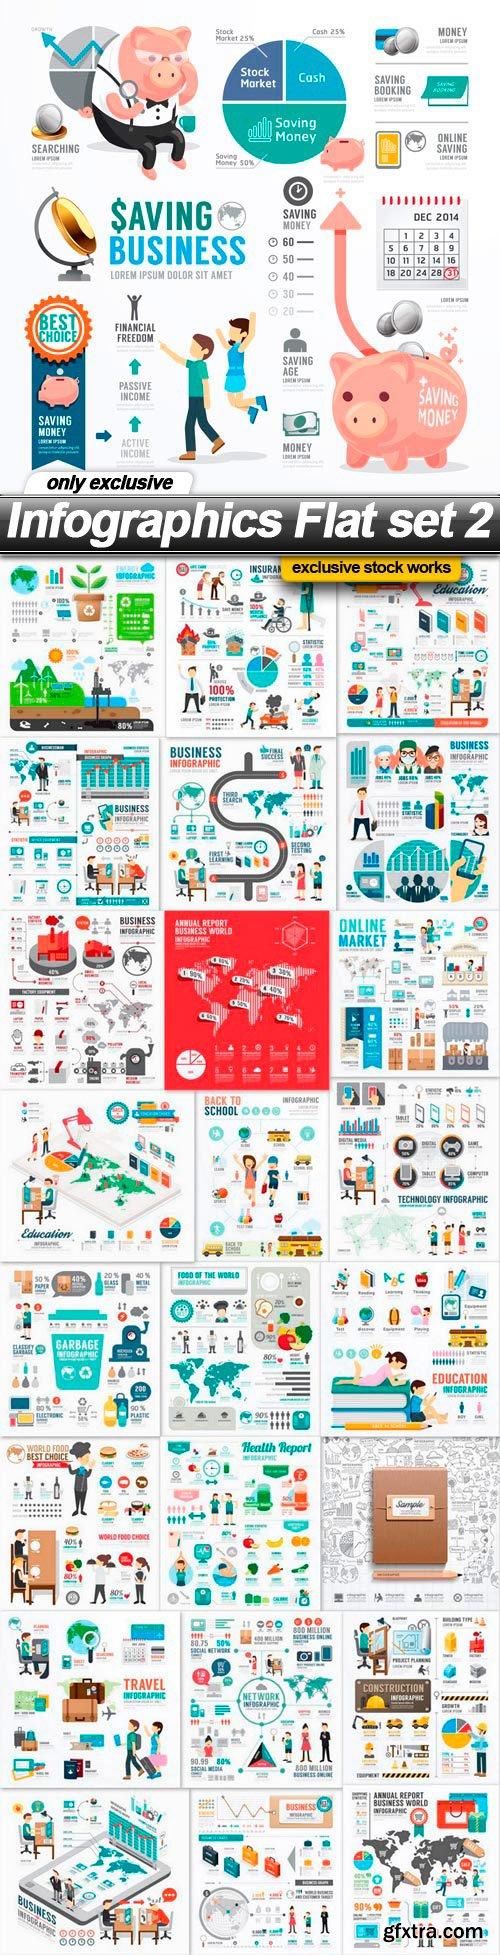 Infographics Flat set 2 - 25 EPS